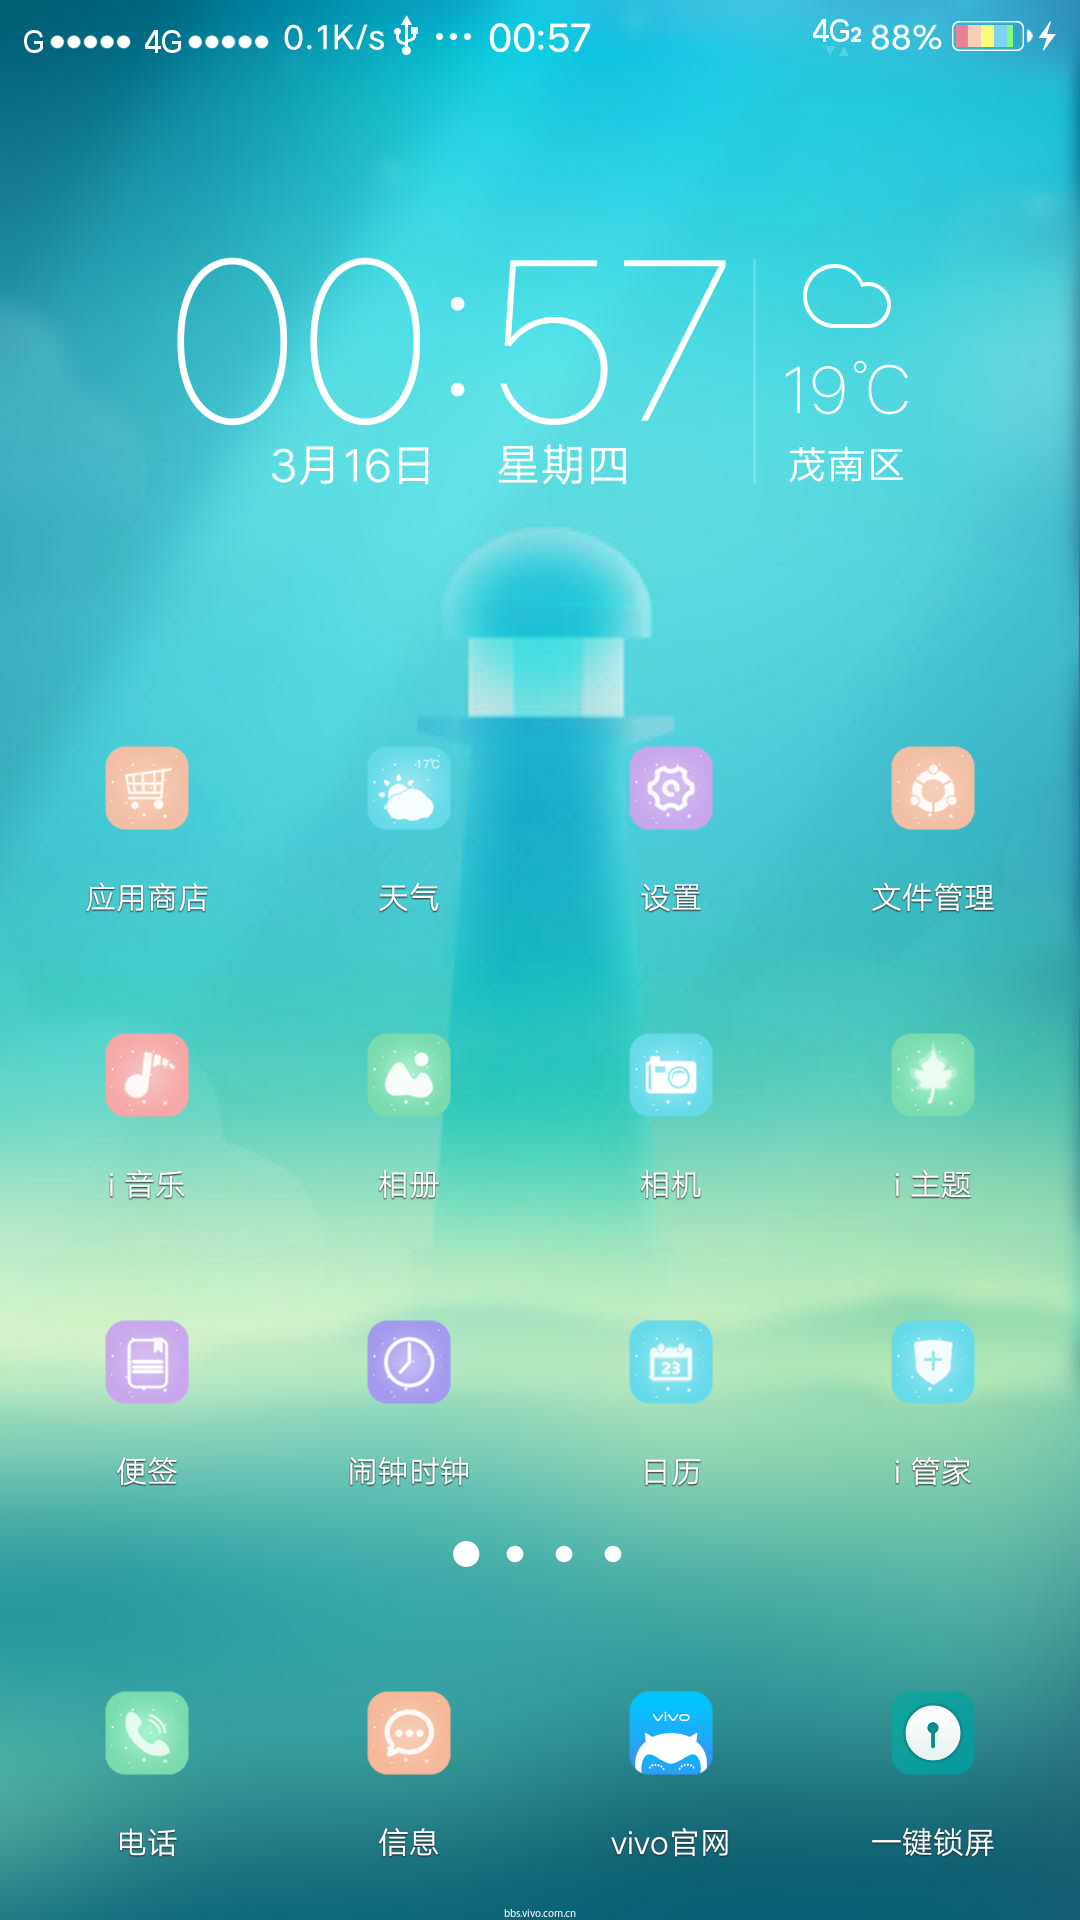 【x9】小清新(圆点信号 彩虹电量 小图标 透明状态栏)